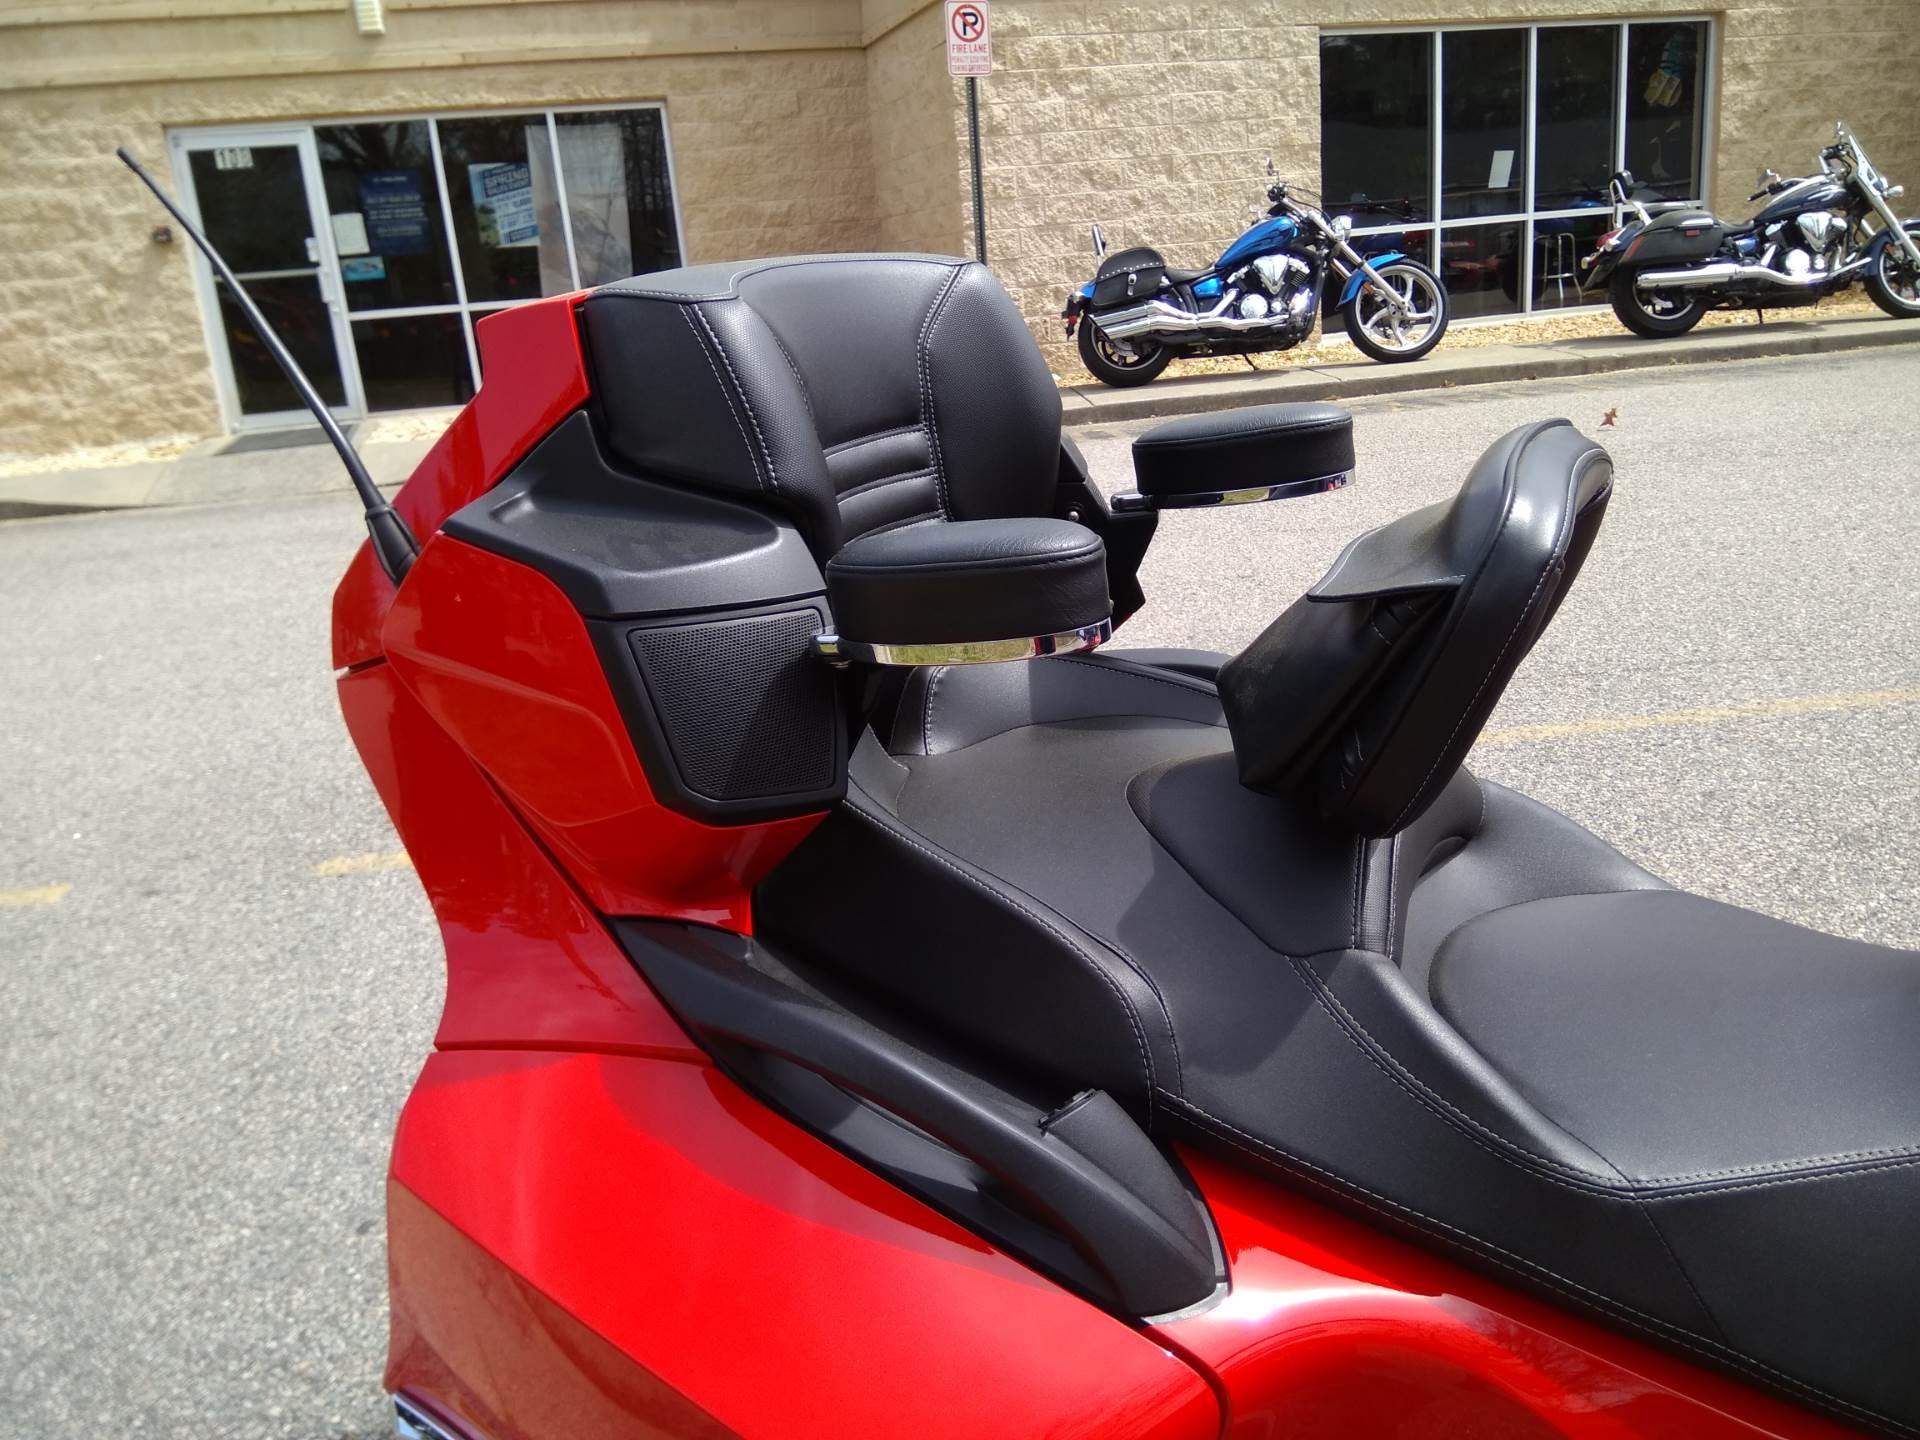 2013 Can-Am Spyder® RT-S SE5 in Chesapeake, Virginia